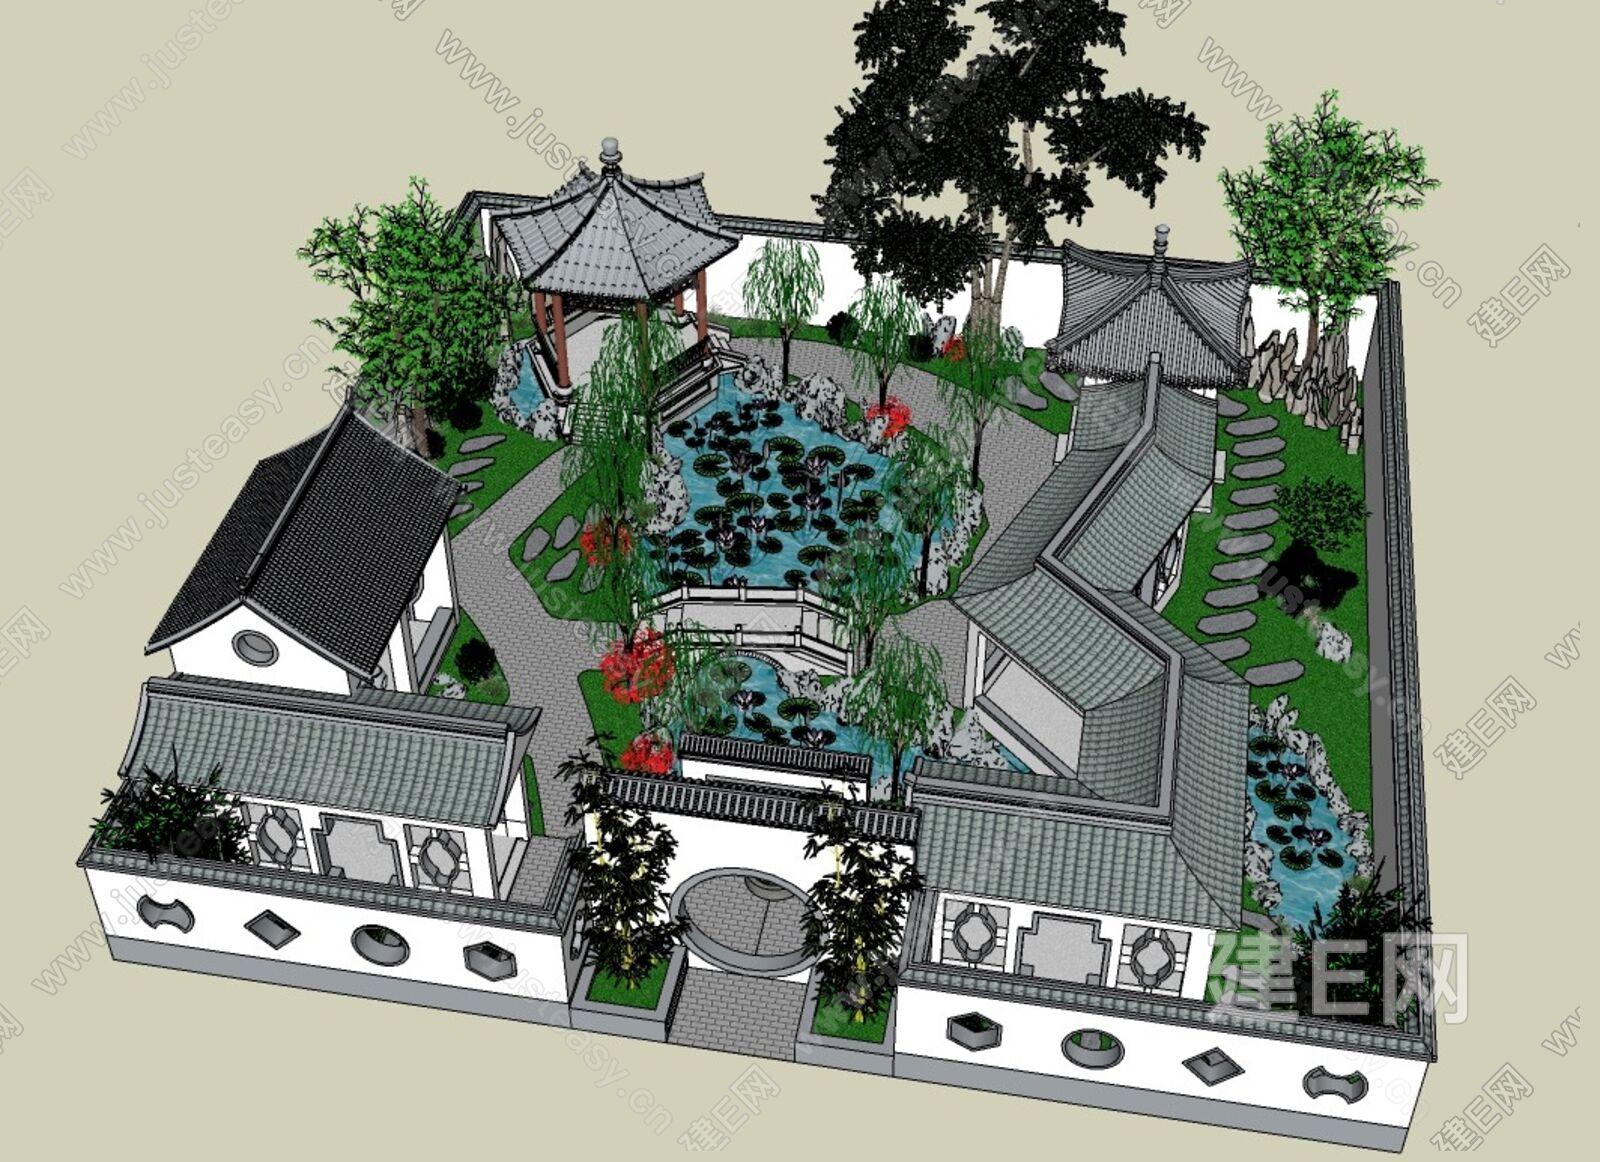 古典园林sketchup模型